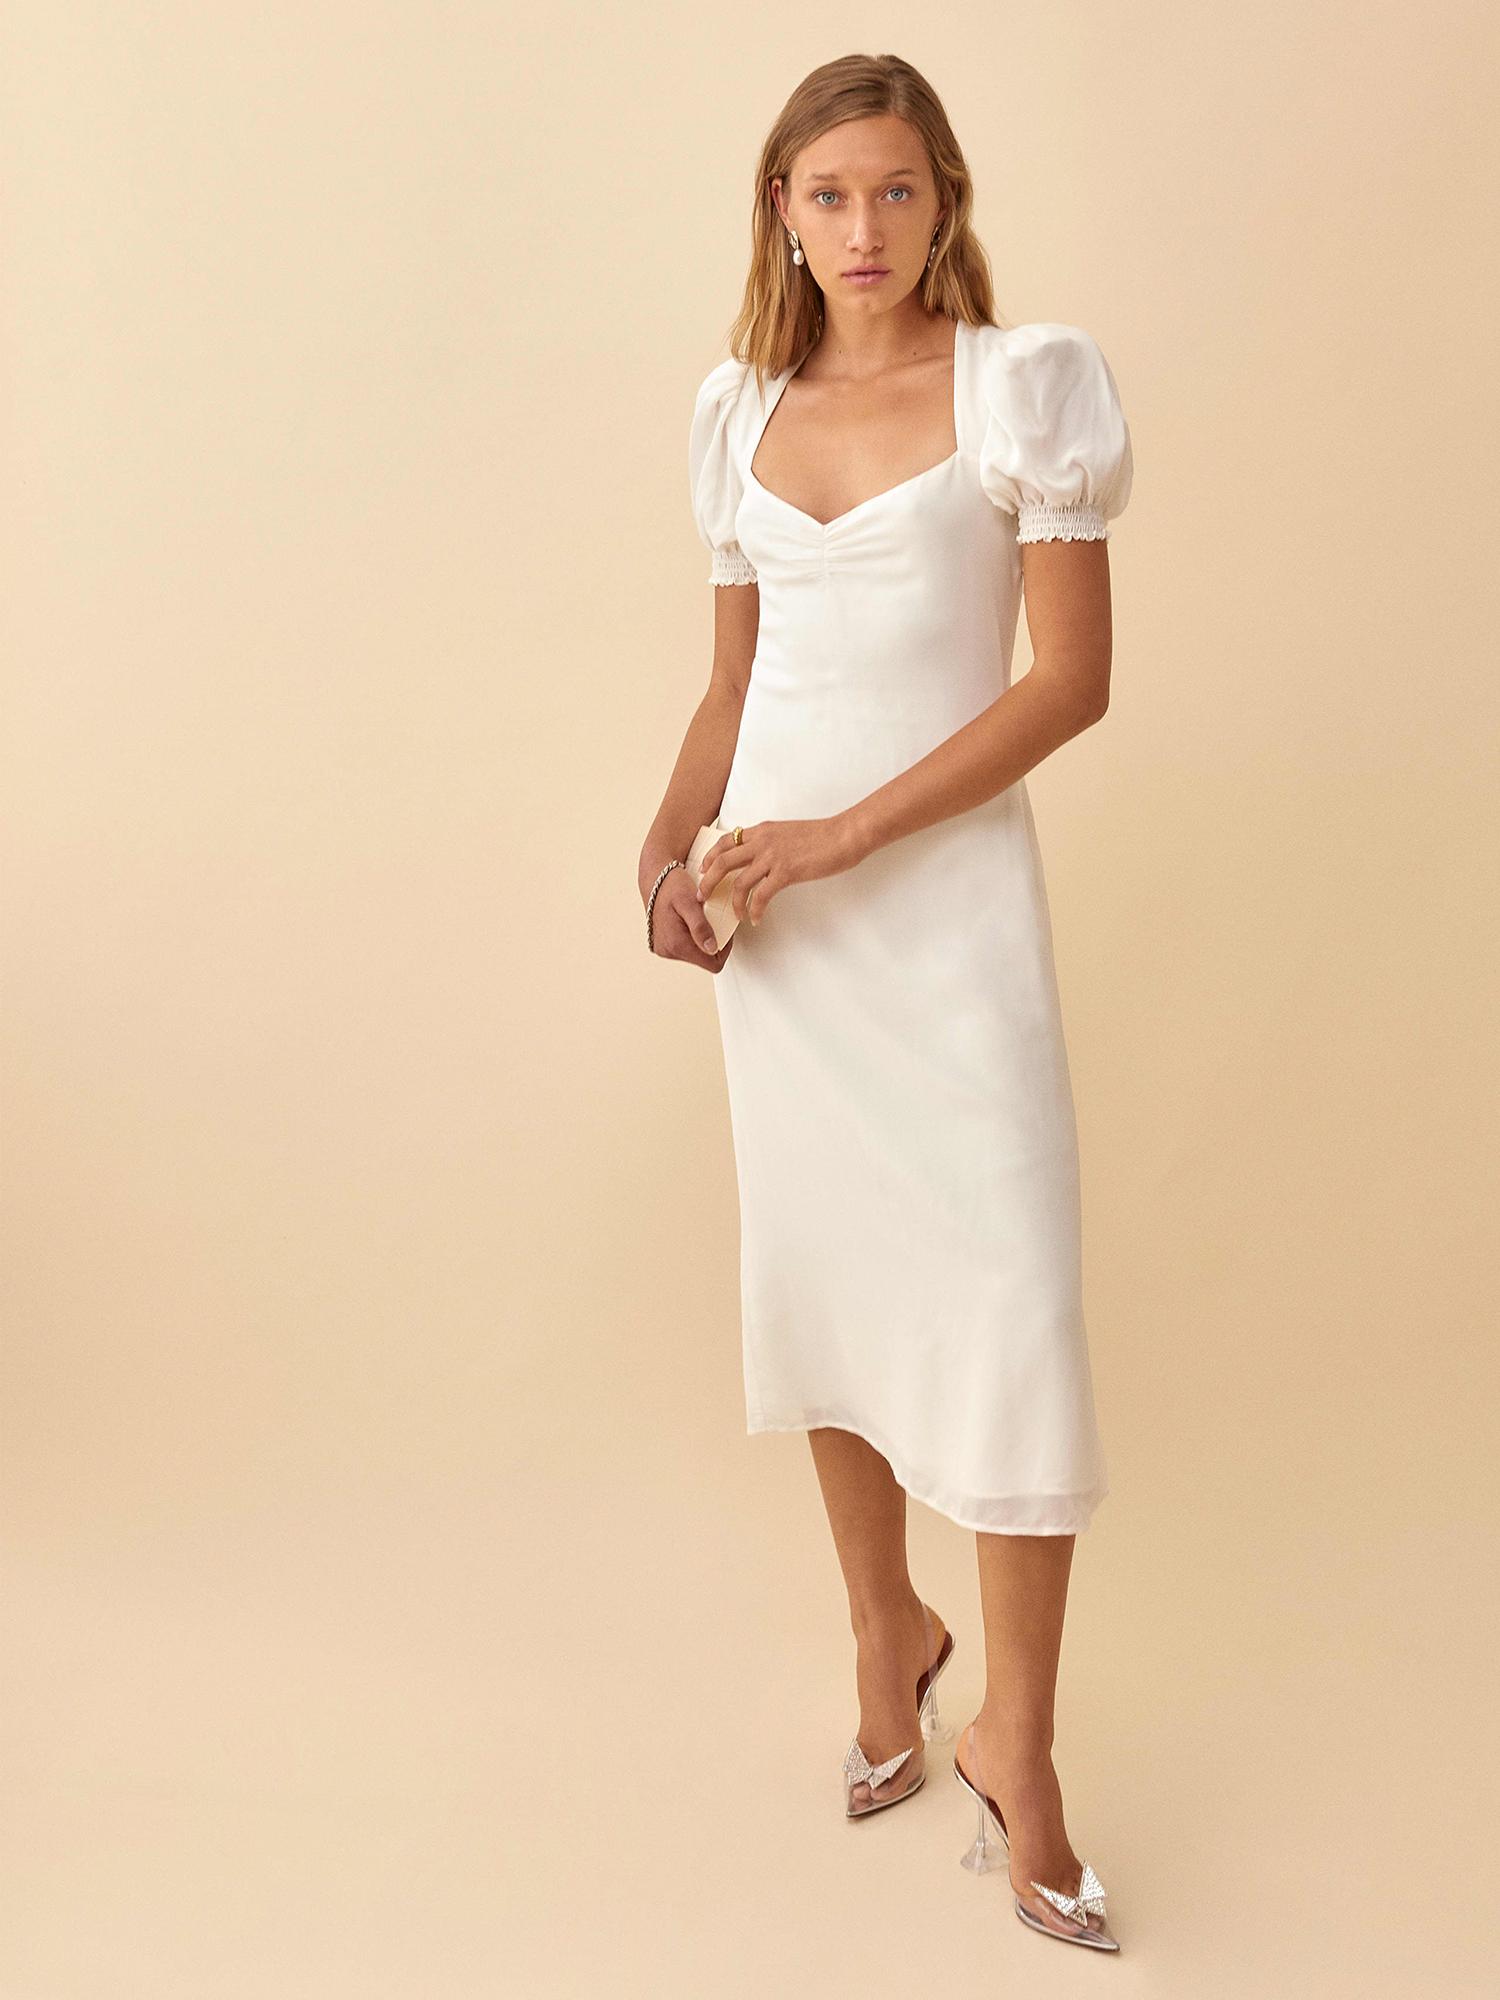 luciana reformation puff sleeve wedding dress